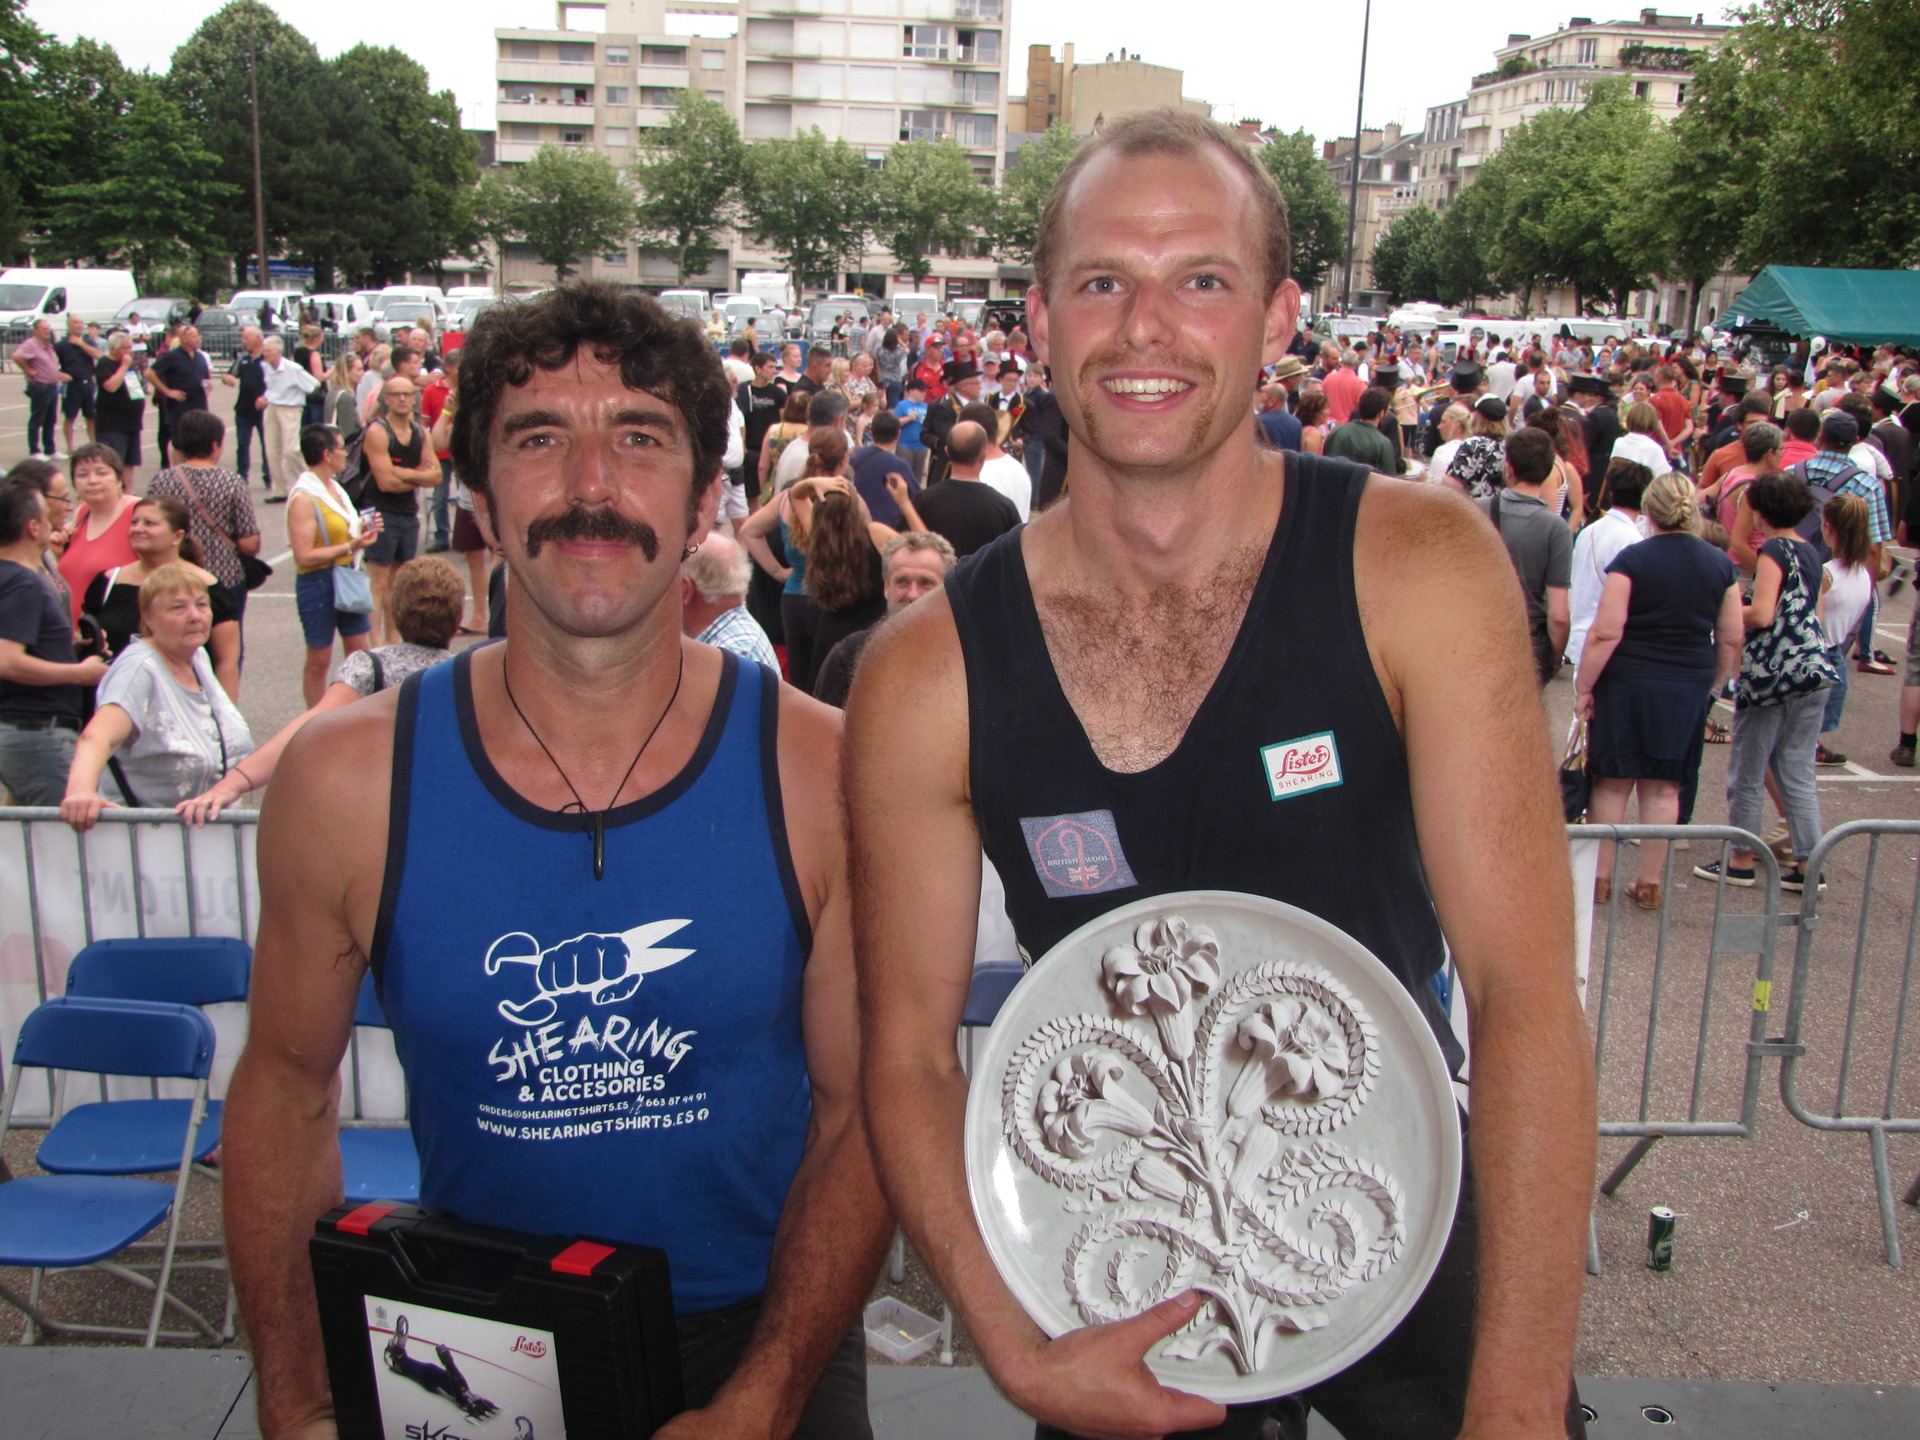 Jack Fagan wins All-Nations speed shear - NZ Herald